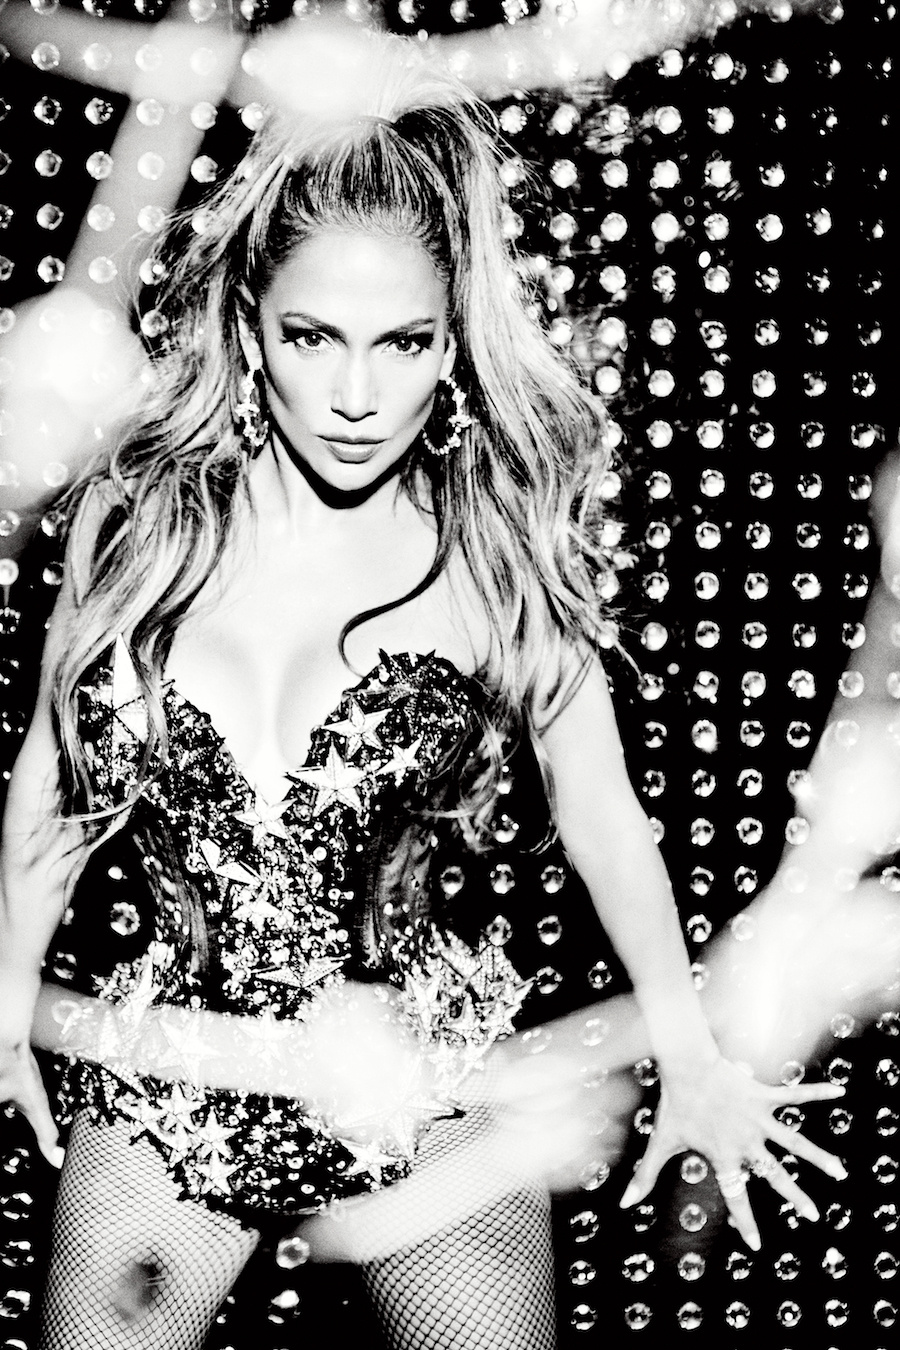 Jennifer-Lopez-Sexy-6-thefappeningblog.com_-1.jpg